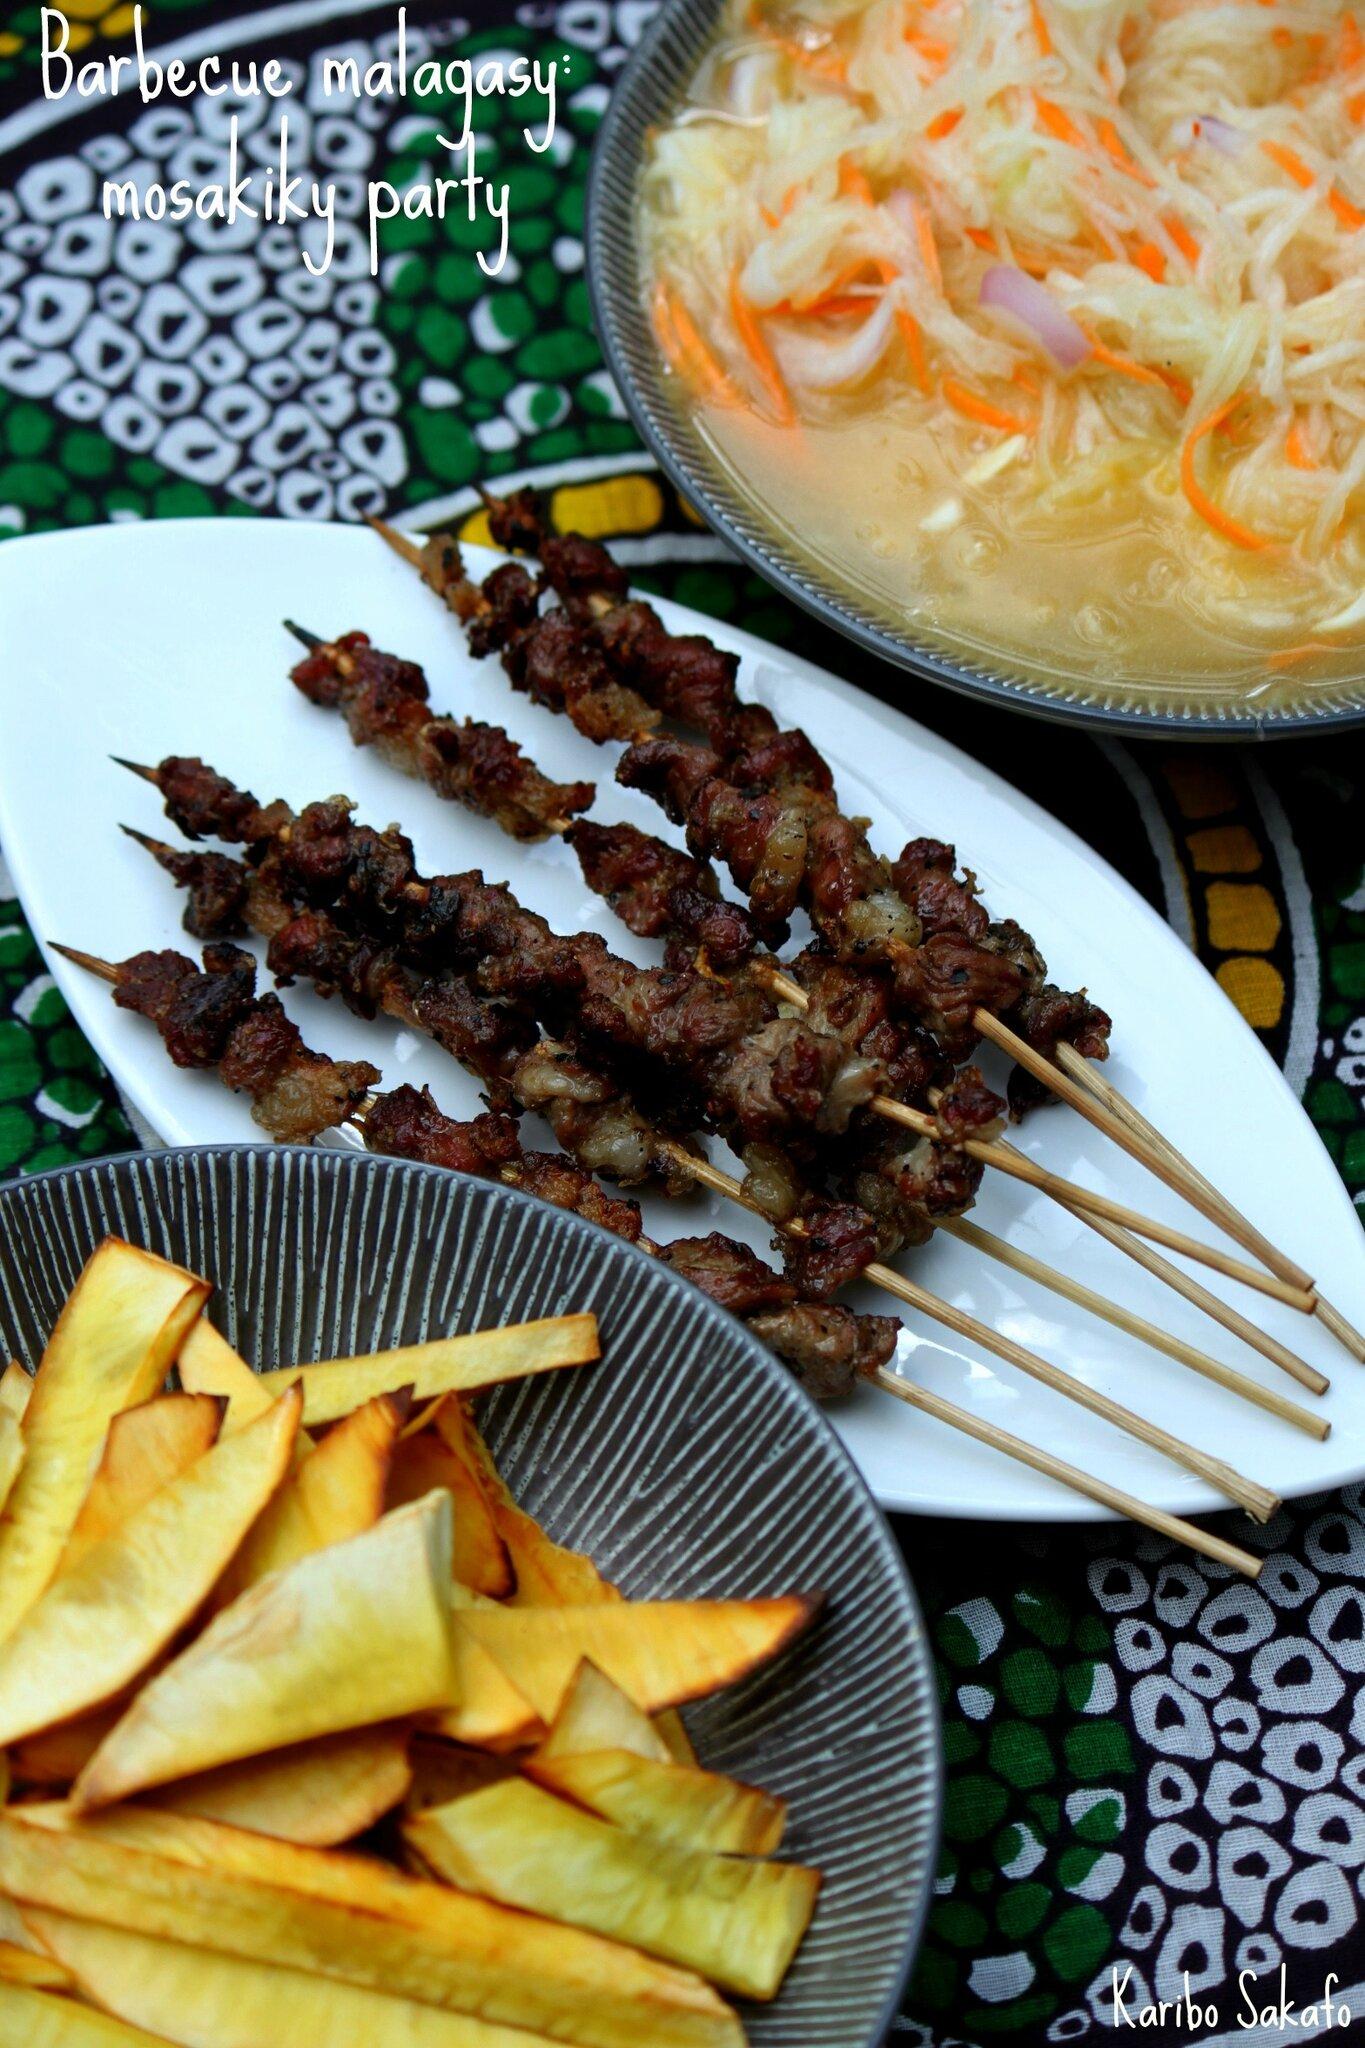 Barbecue malagasy: mosakiky party